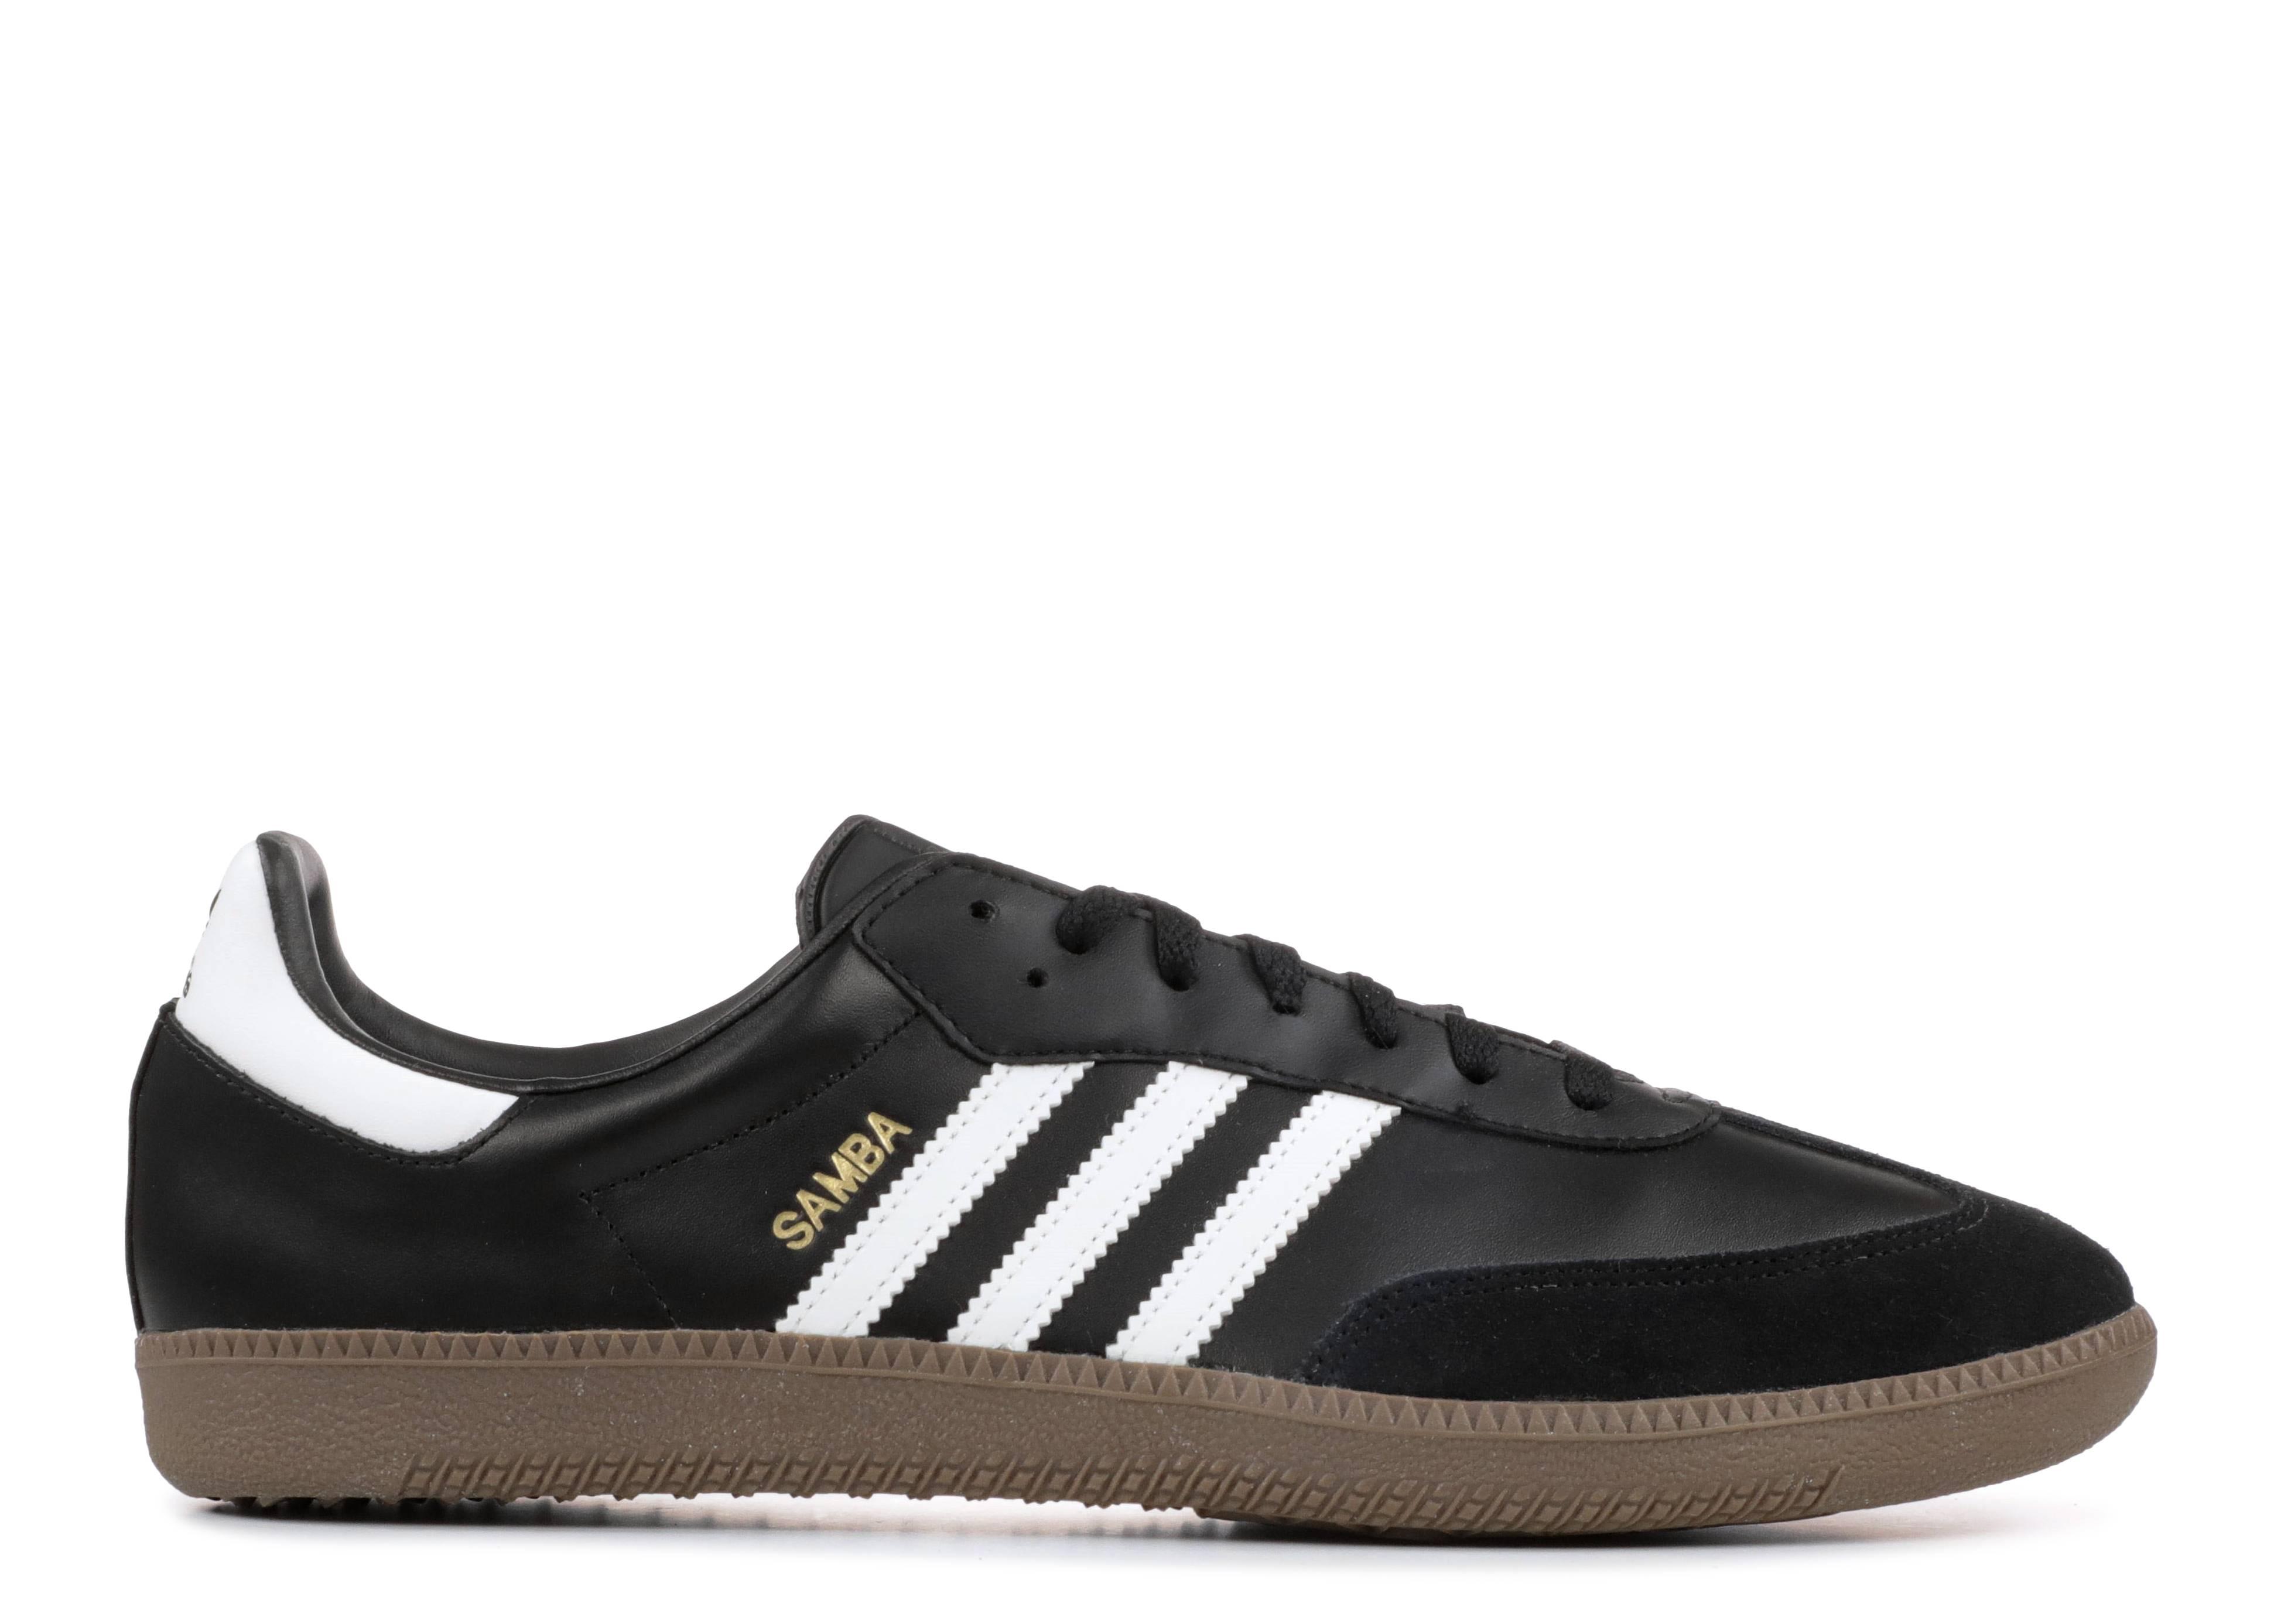 9b3f2928fcc6f Samba - Adidas - g17100 - black1 white gum5